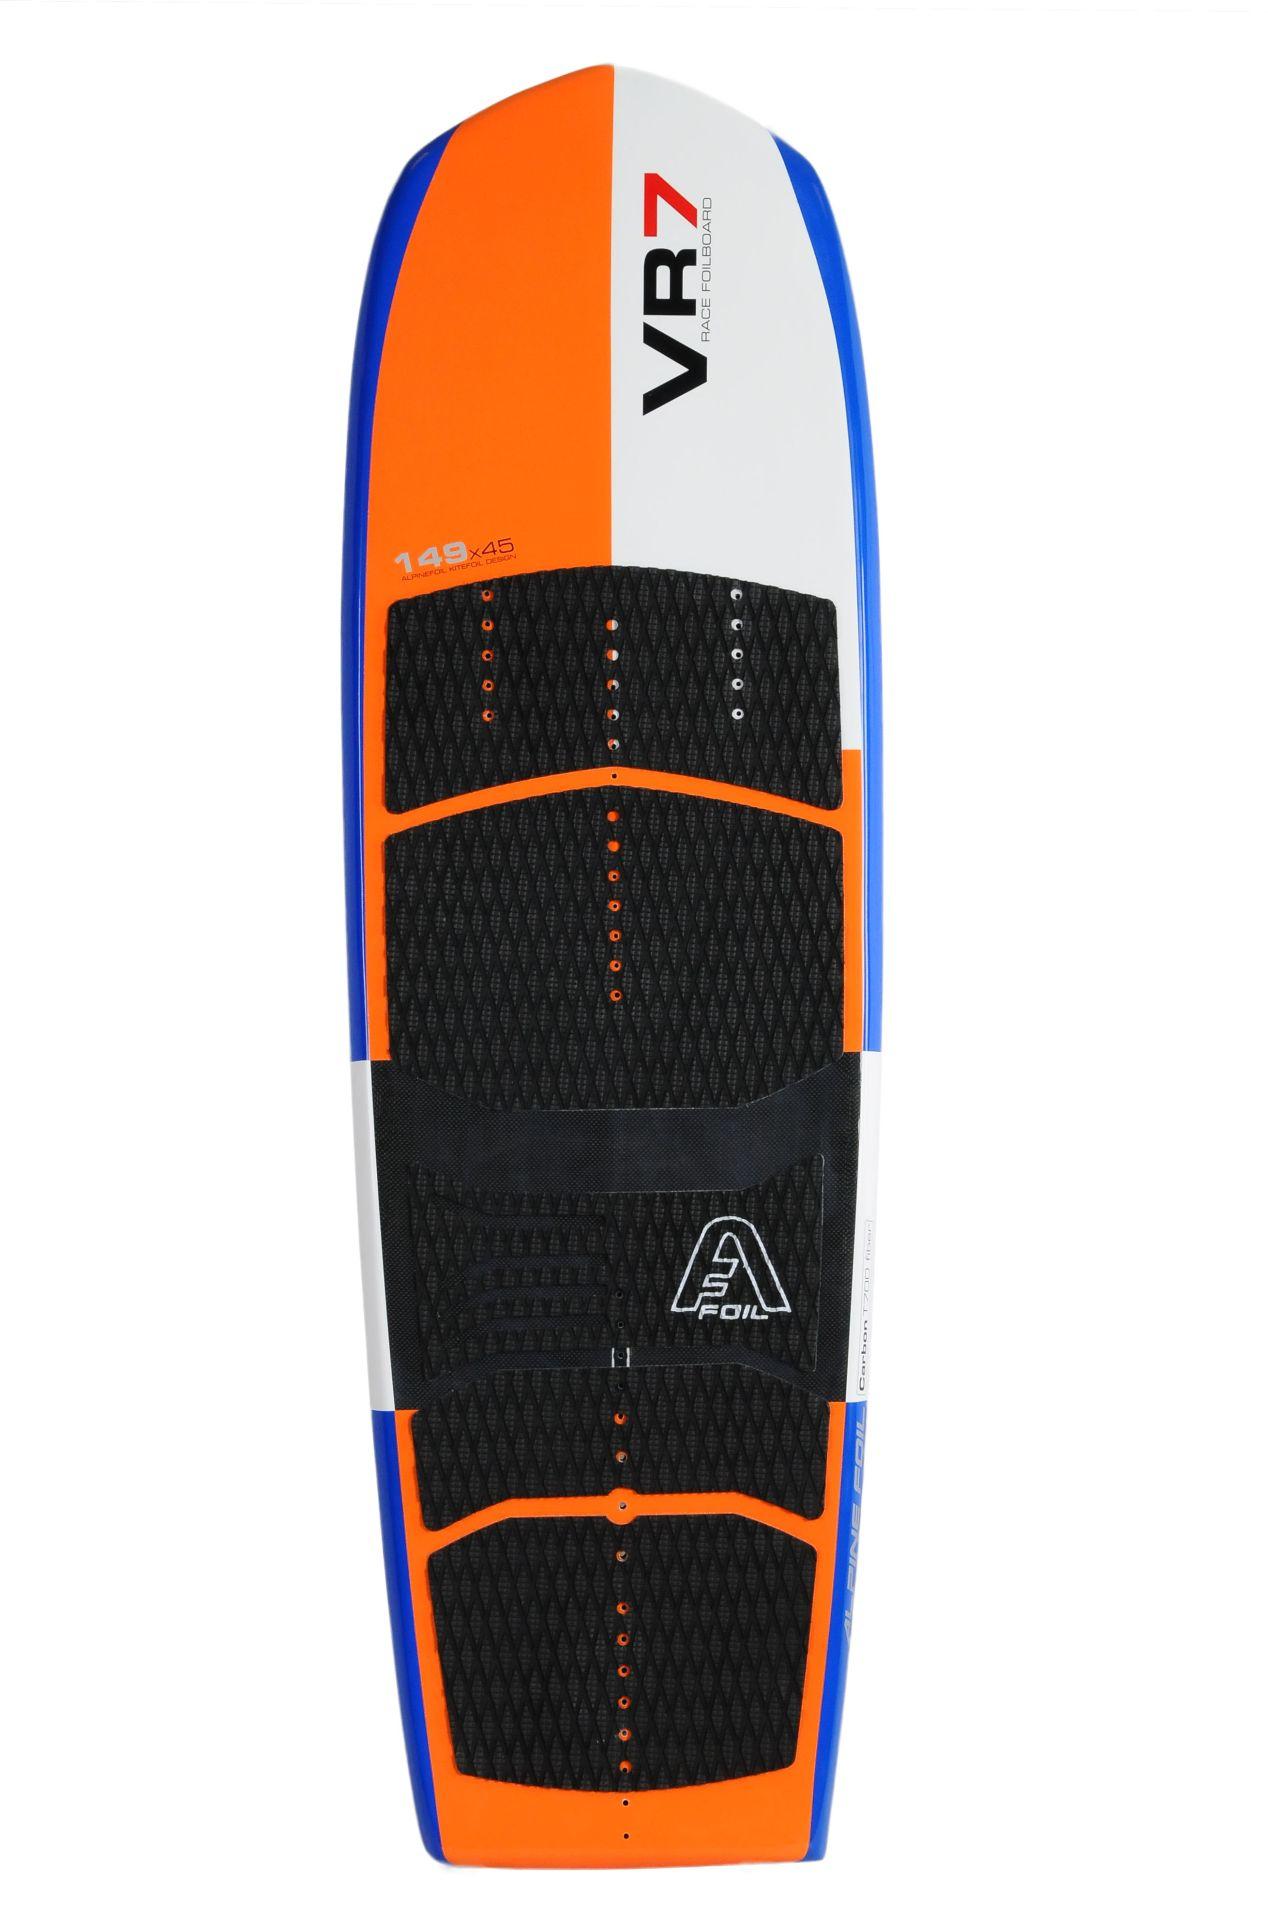 Kitefoil foilboard alpinefoil vr7 6